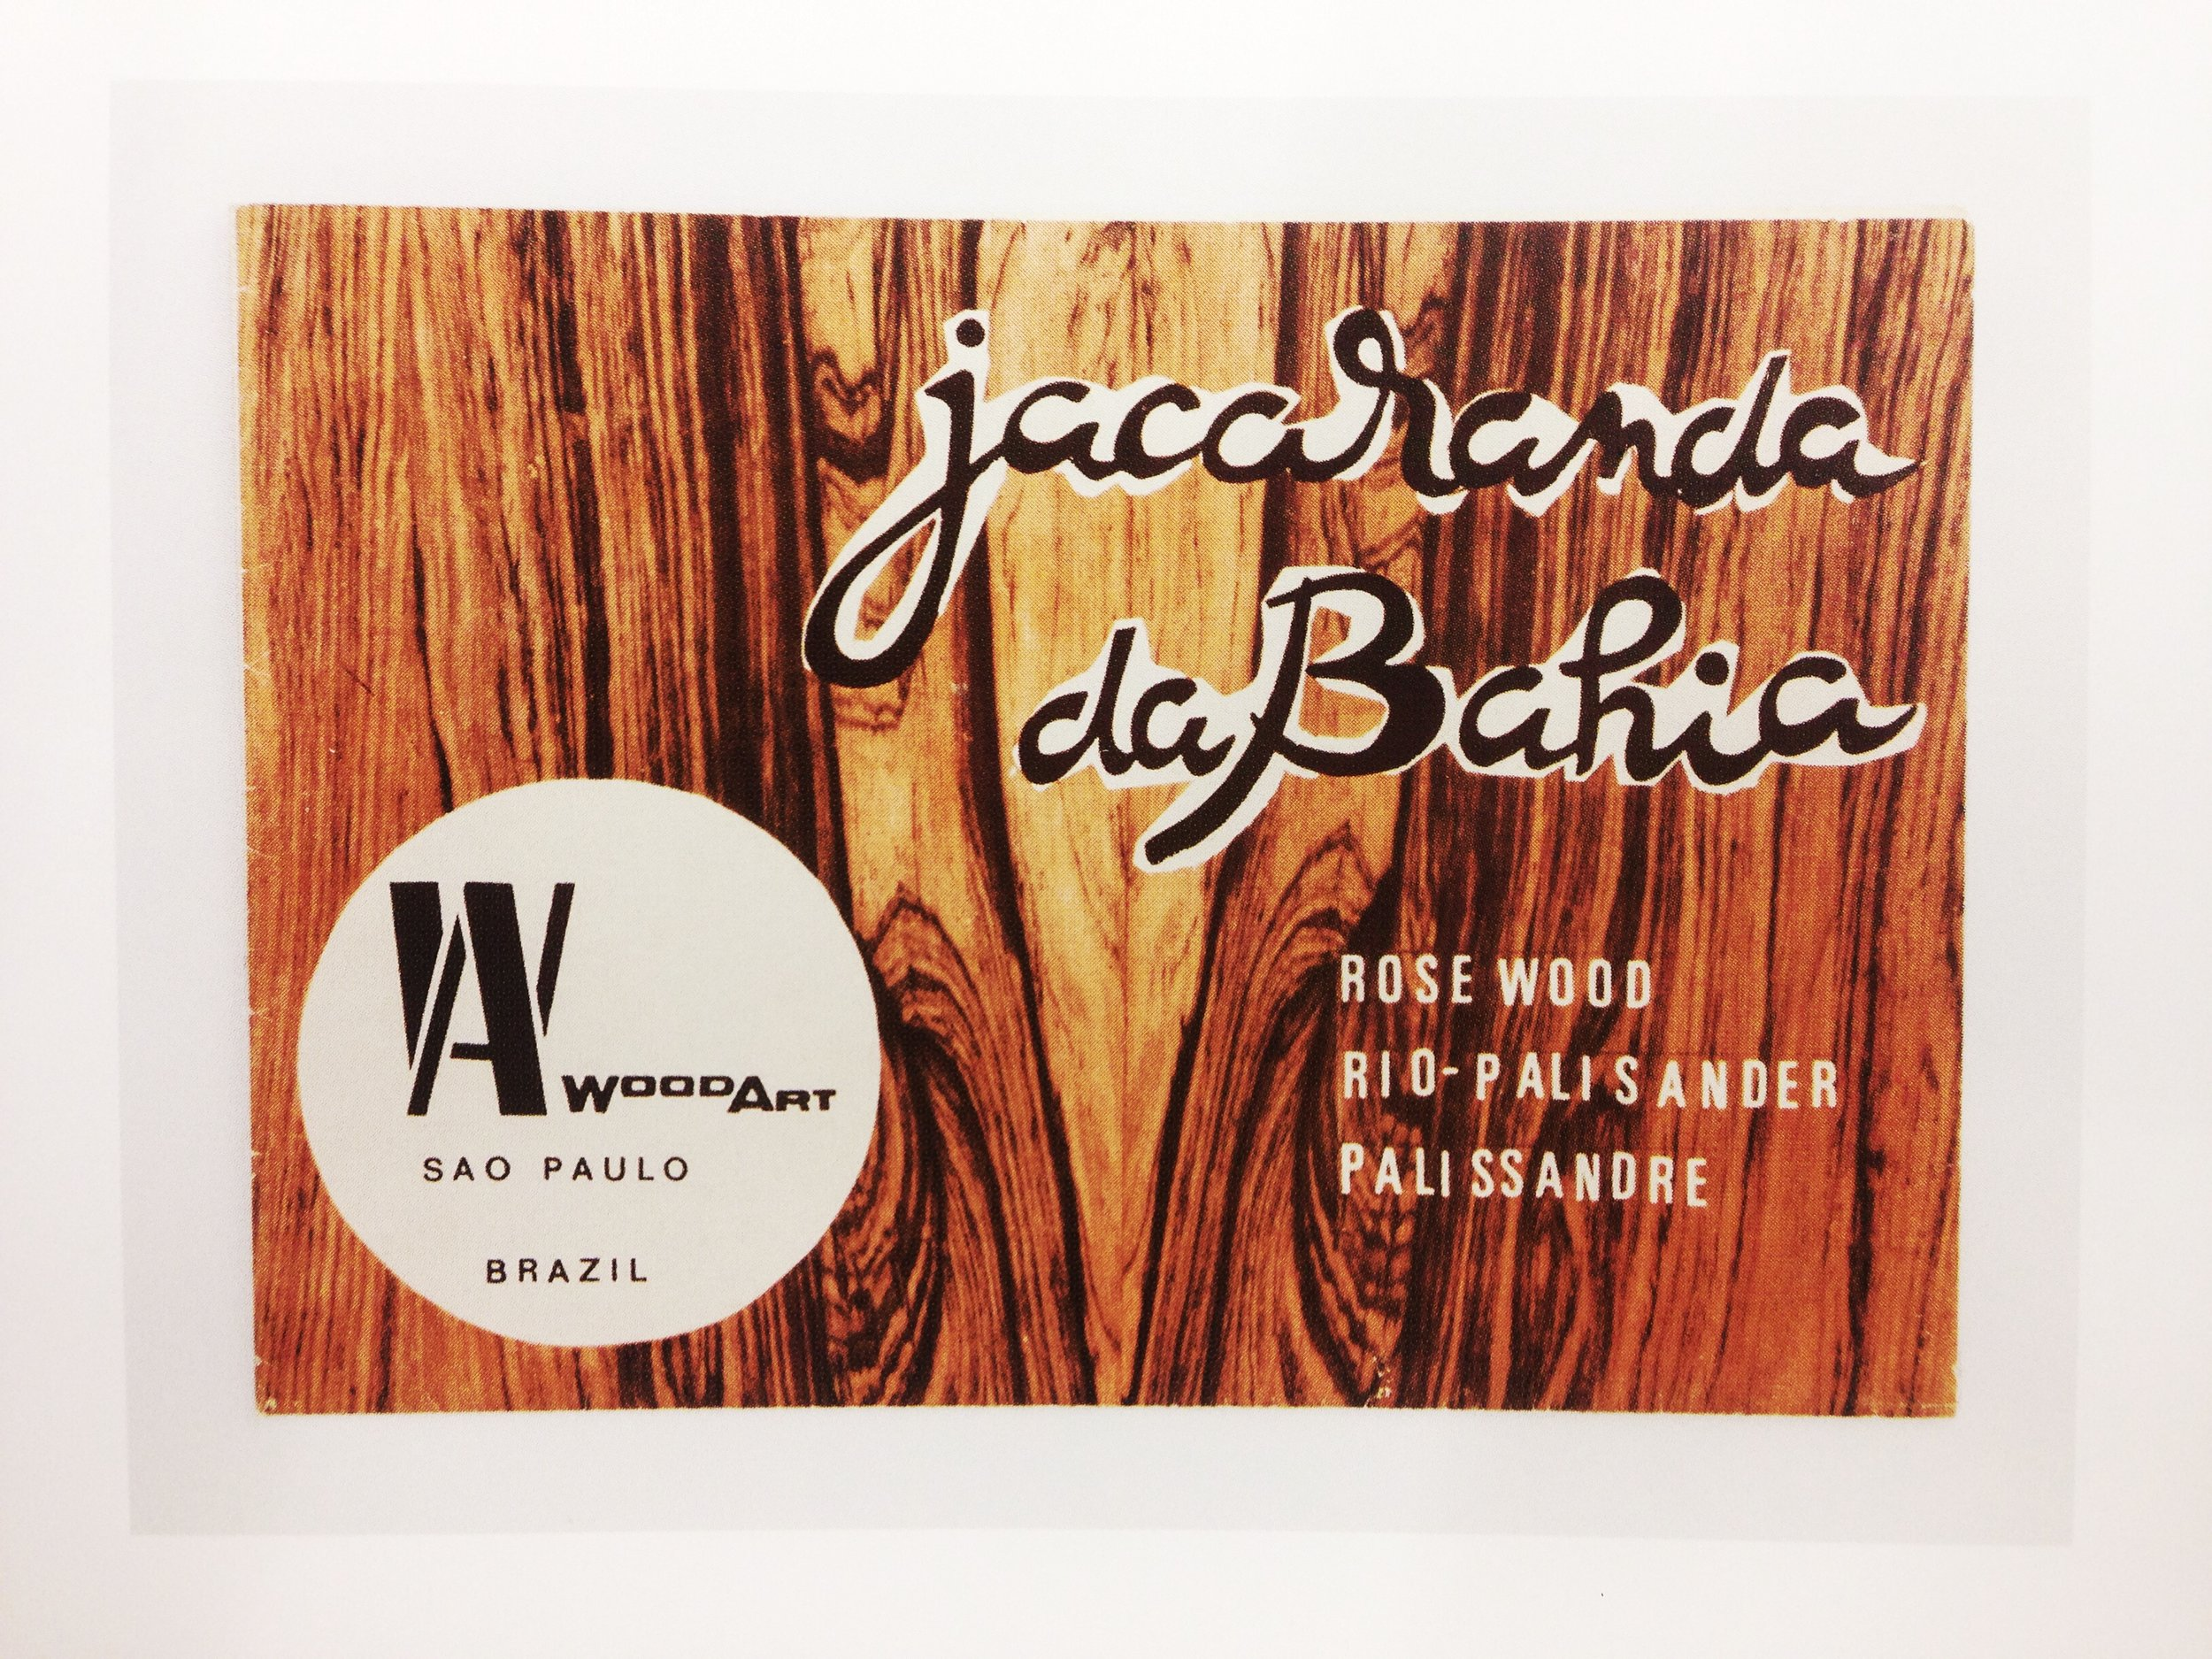 Jacaranda da Bahia